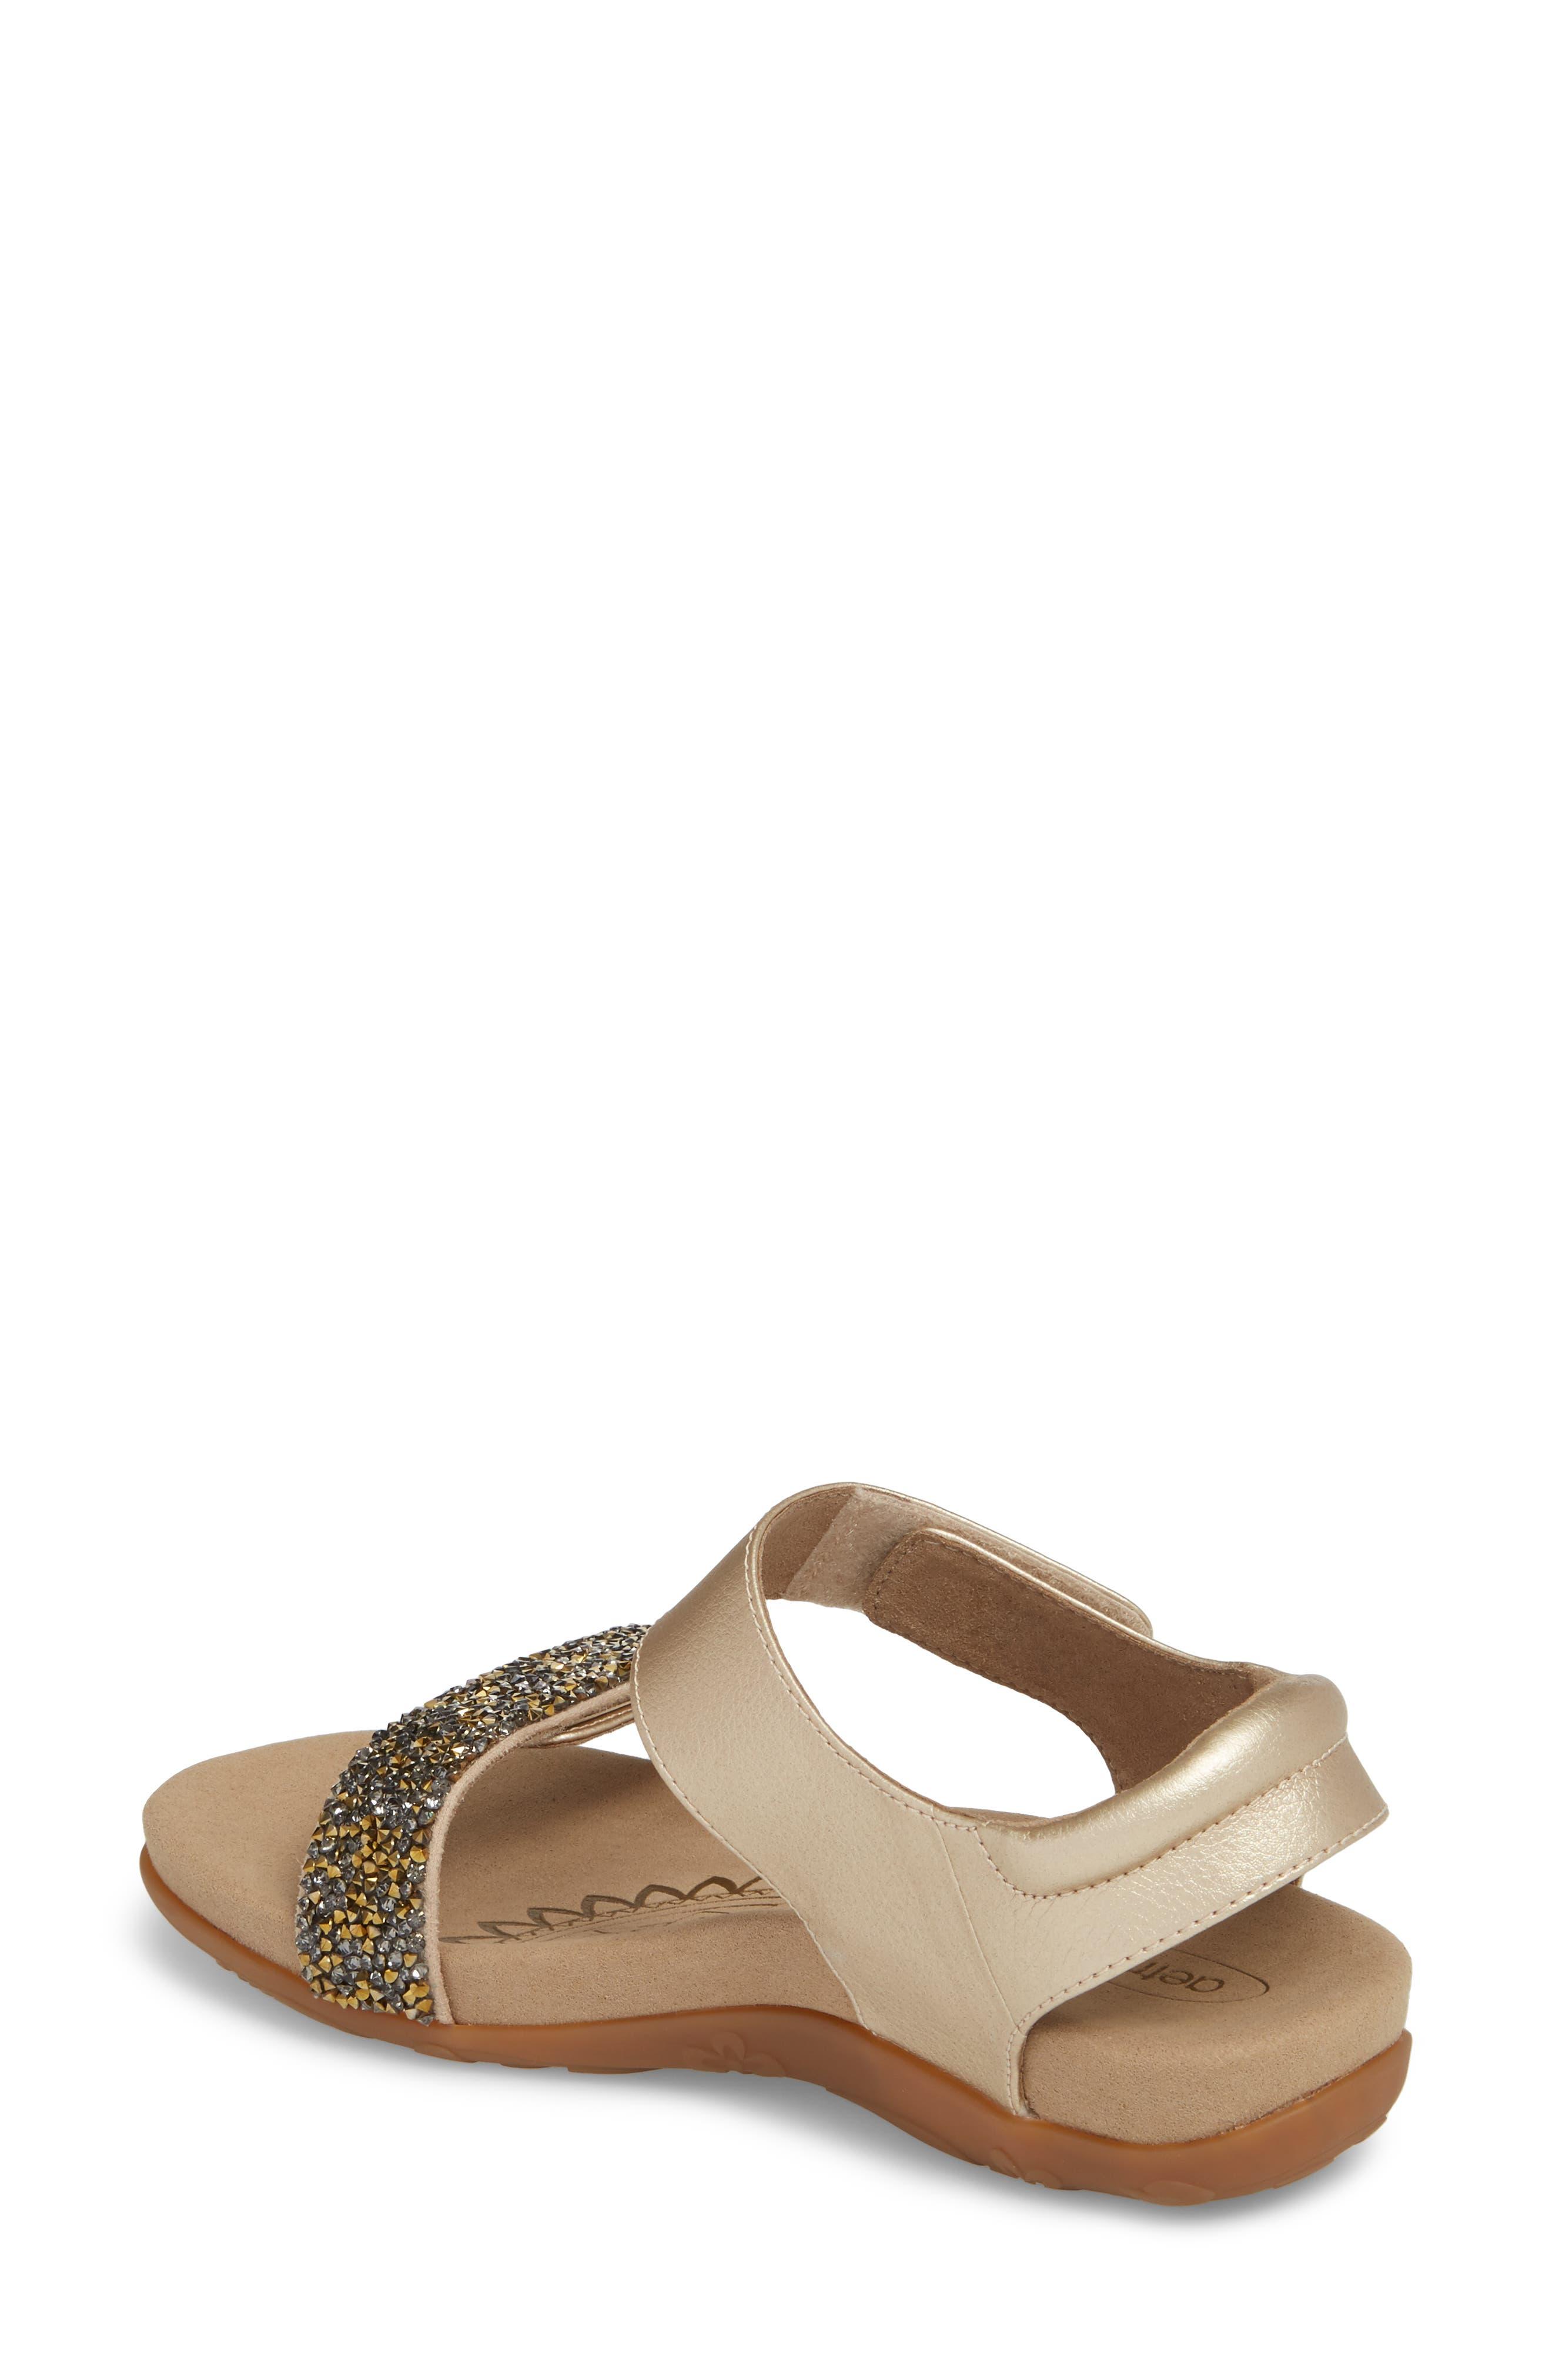 Maria Embellished Sandal,                             Alternate thumbnail 2, color,                             Gold Leather